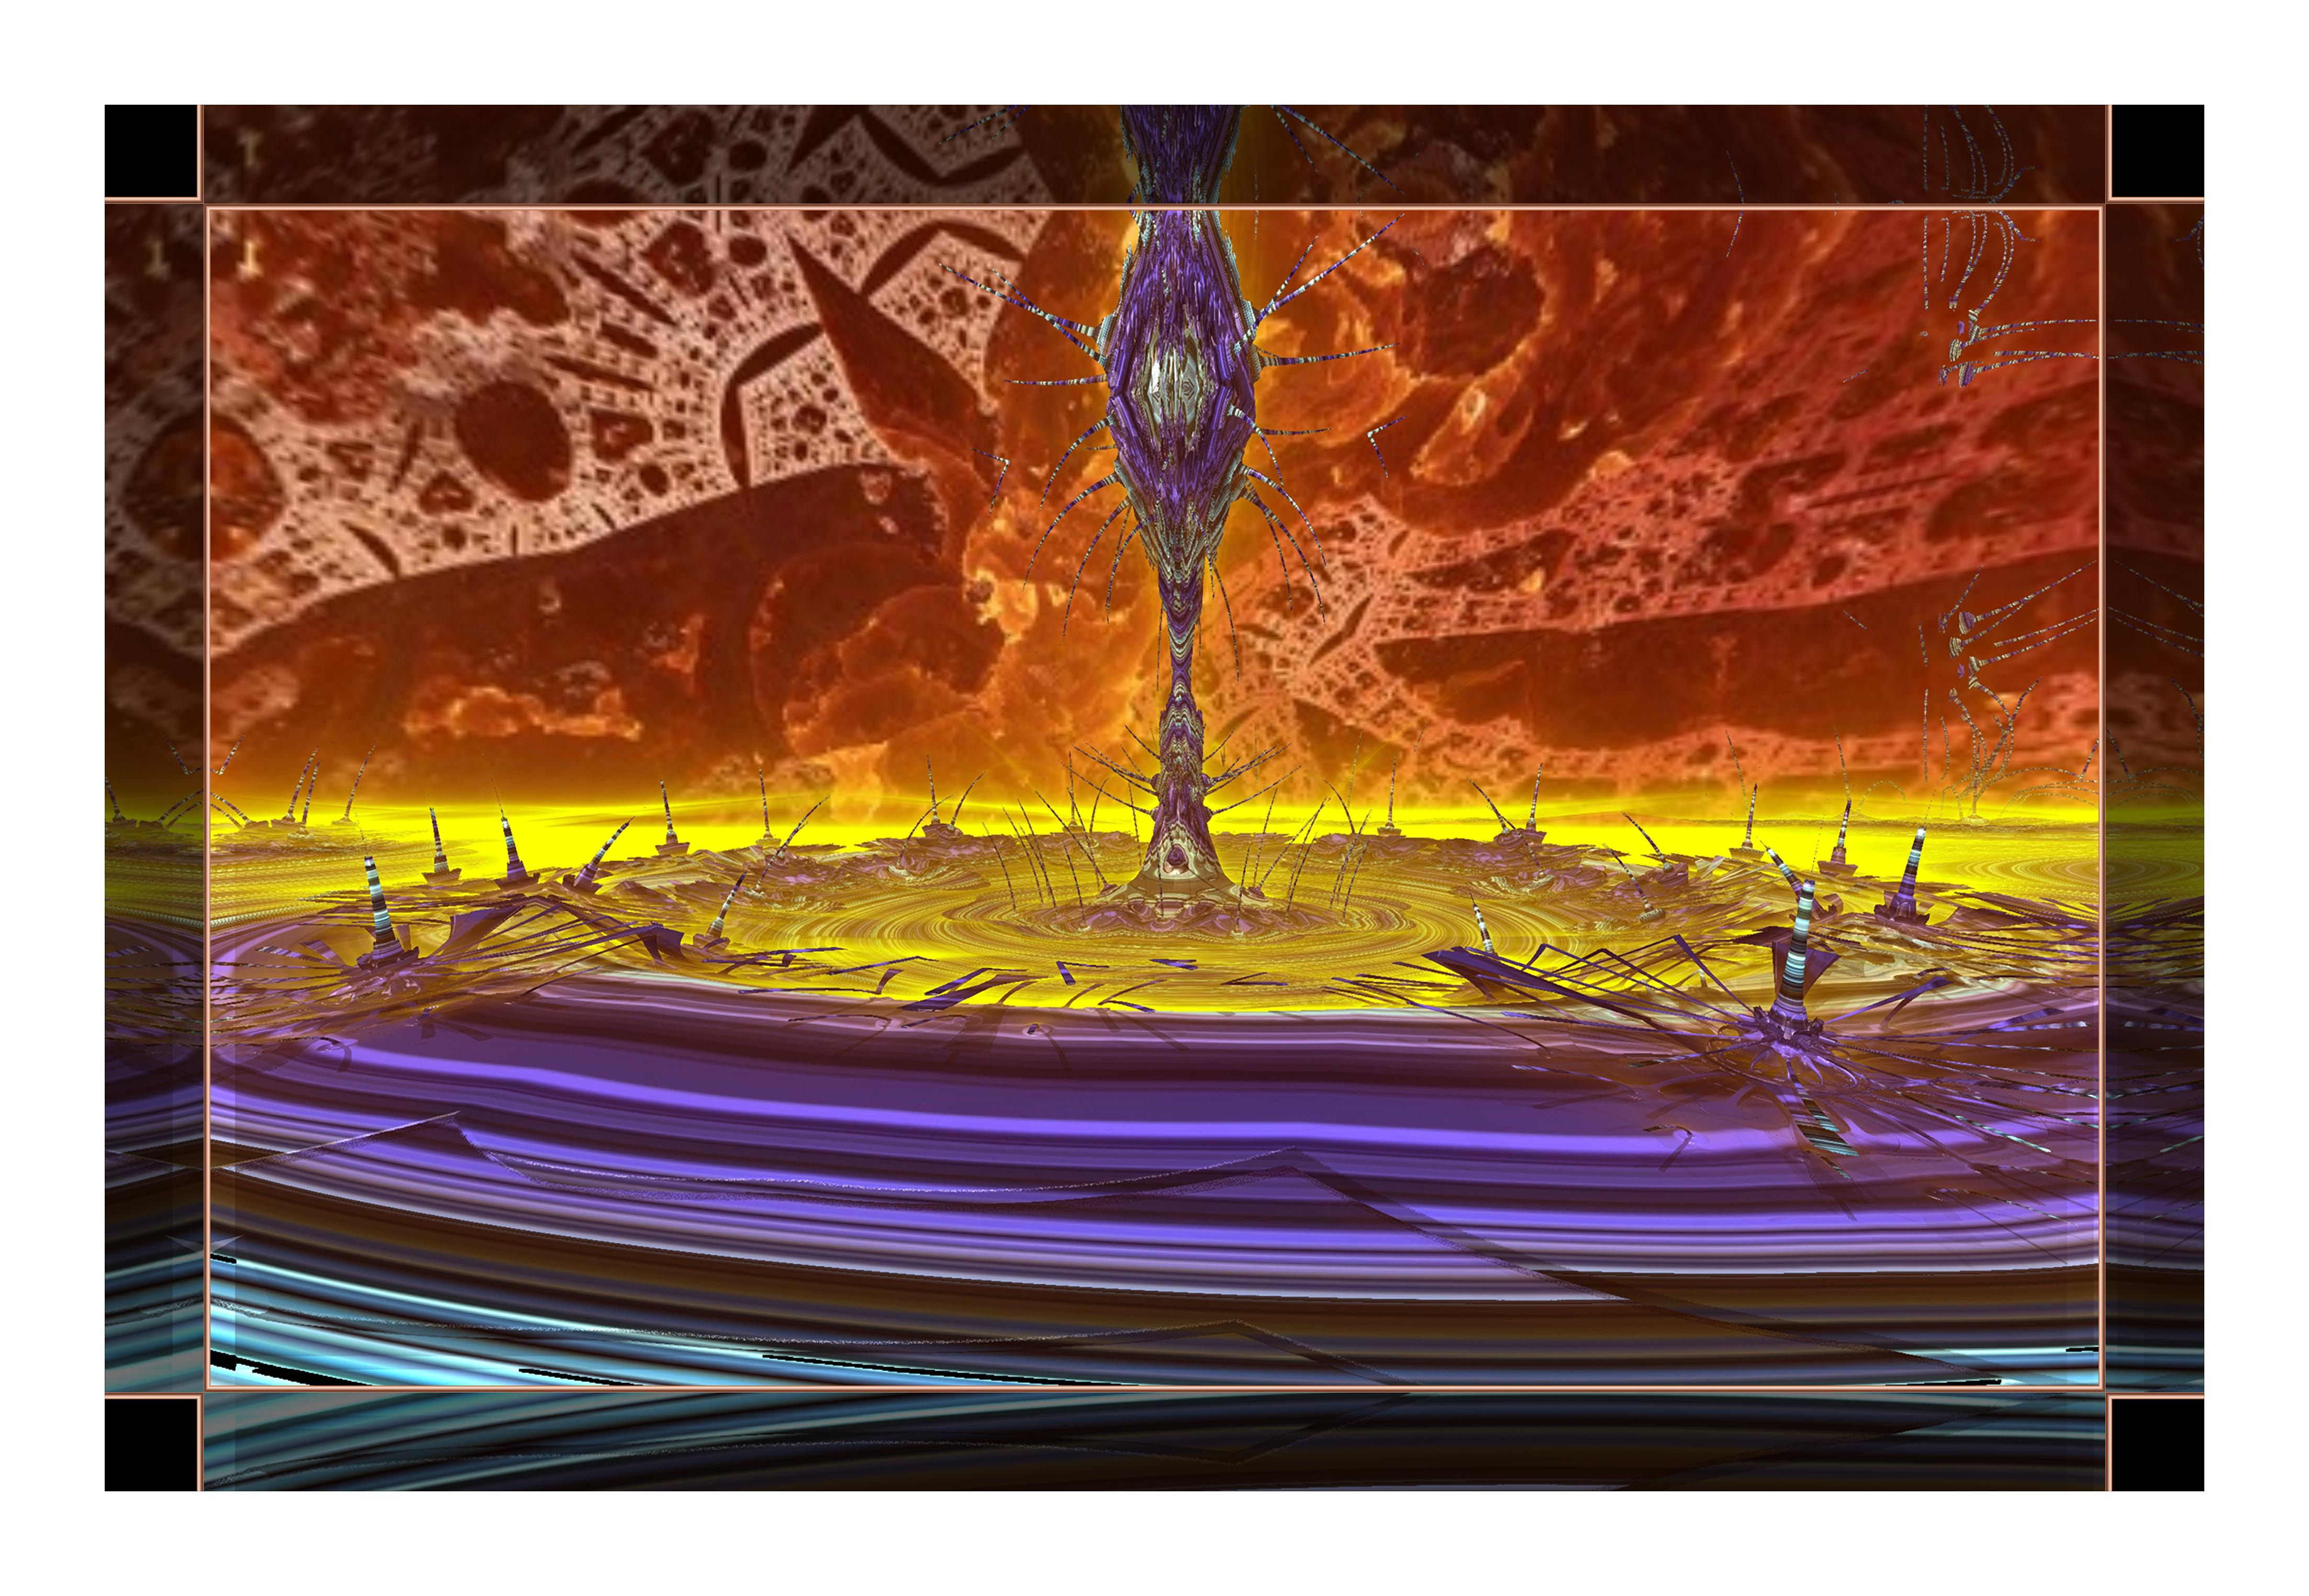 Mandelbulber  vr3 by Topas2012